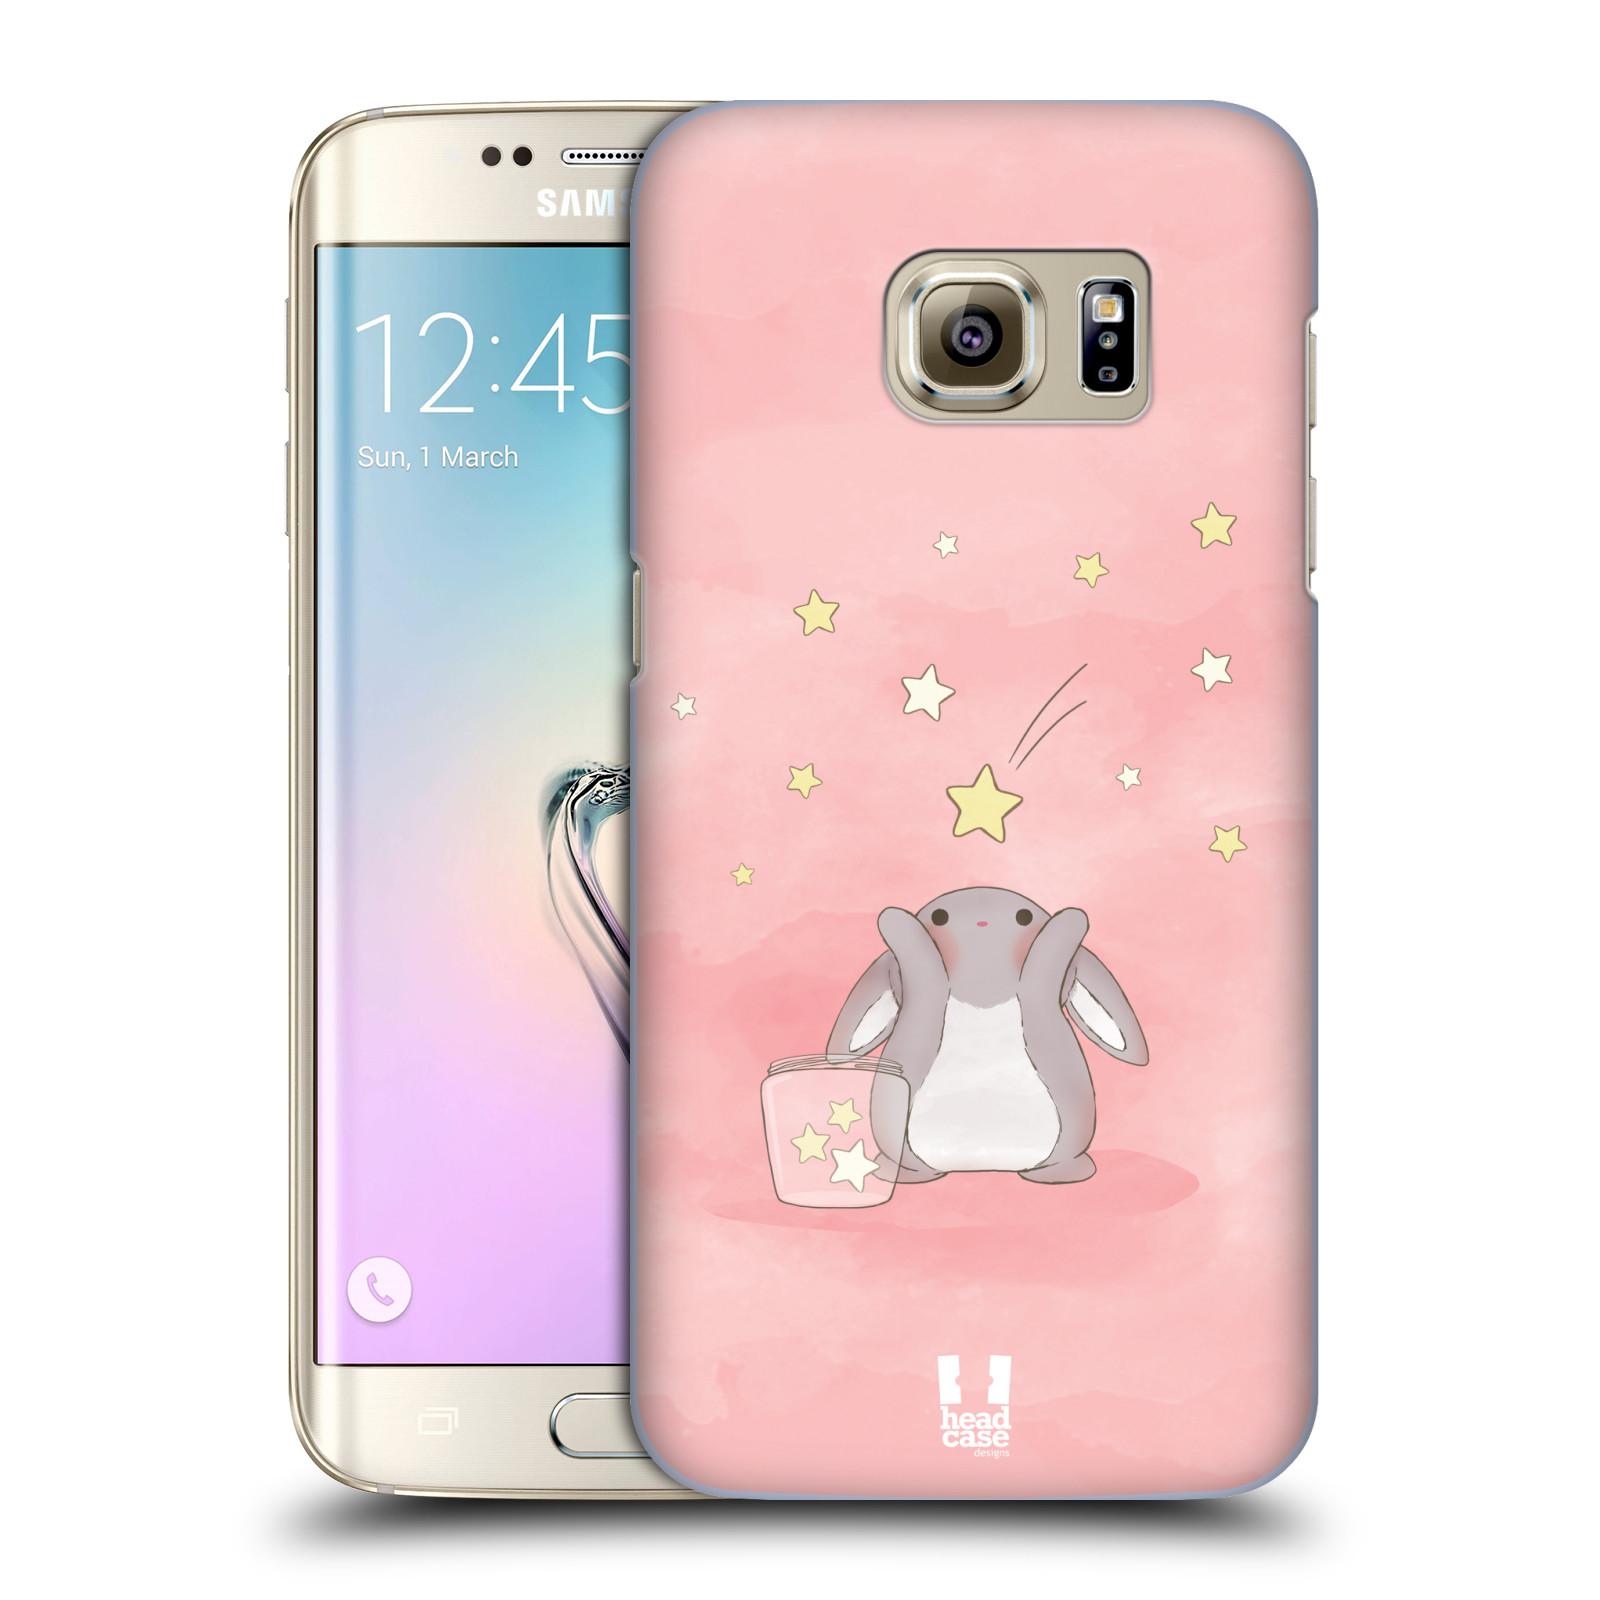 HEAD CASE plastový obal na mobil SAMSUNG GALAXY S7 EDGE vzor králíček a hvězdy růžová